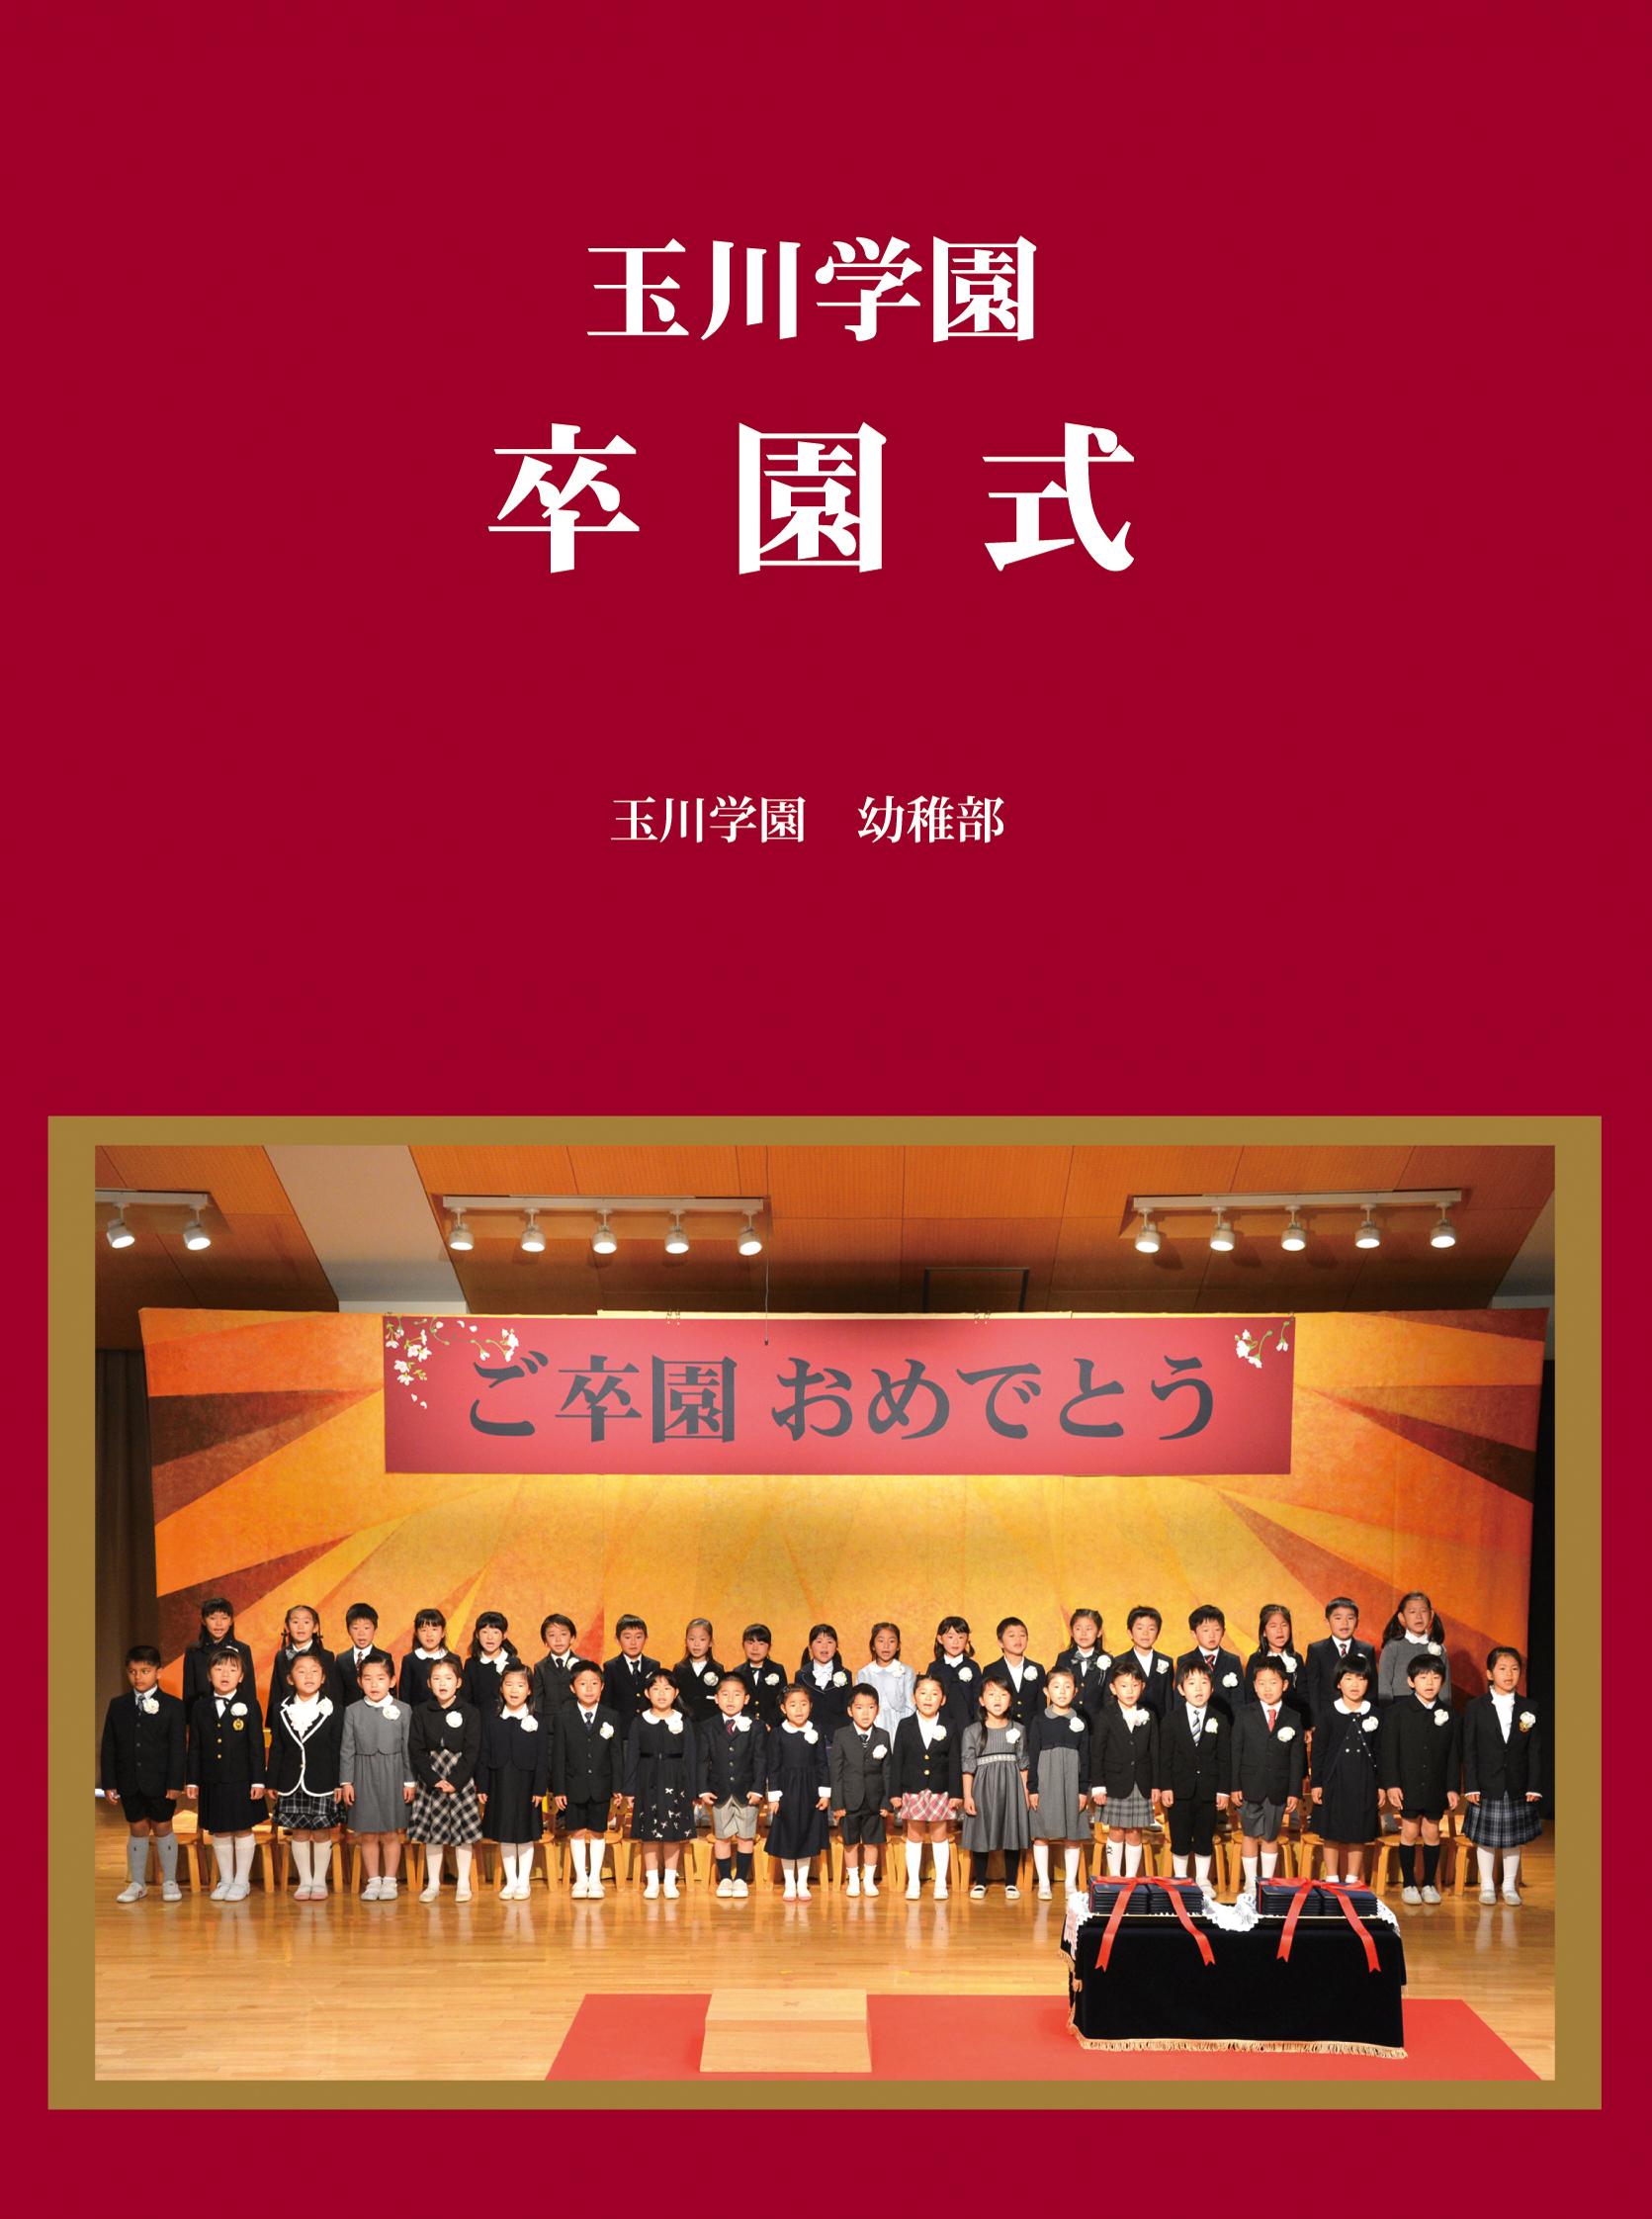 幼稚部卒園式DVD【送料込み】